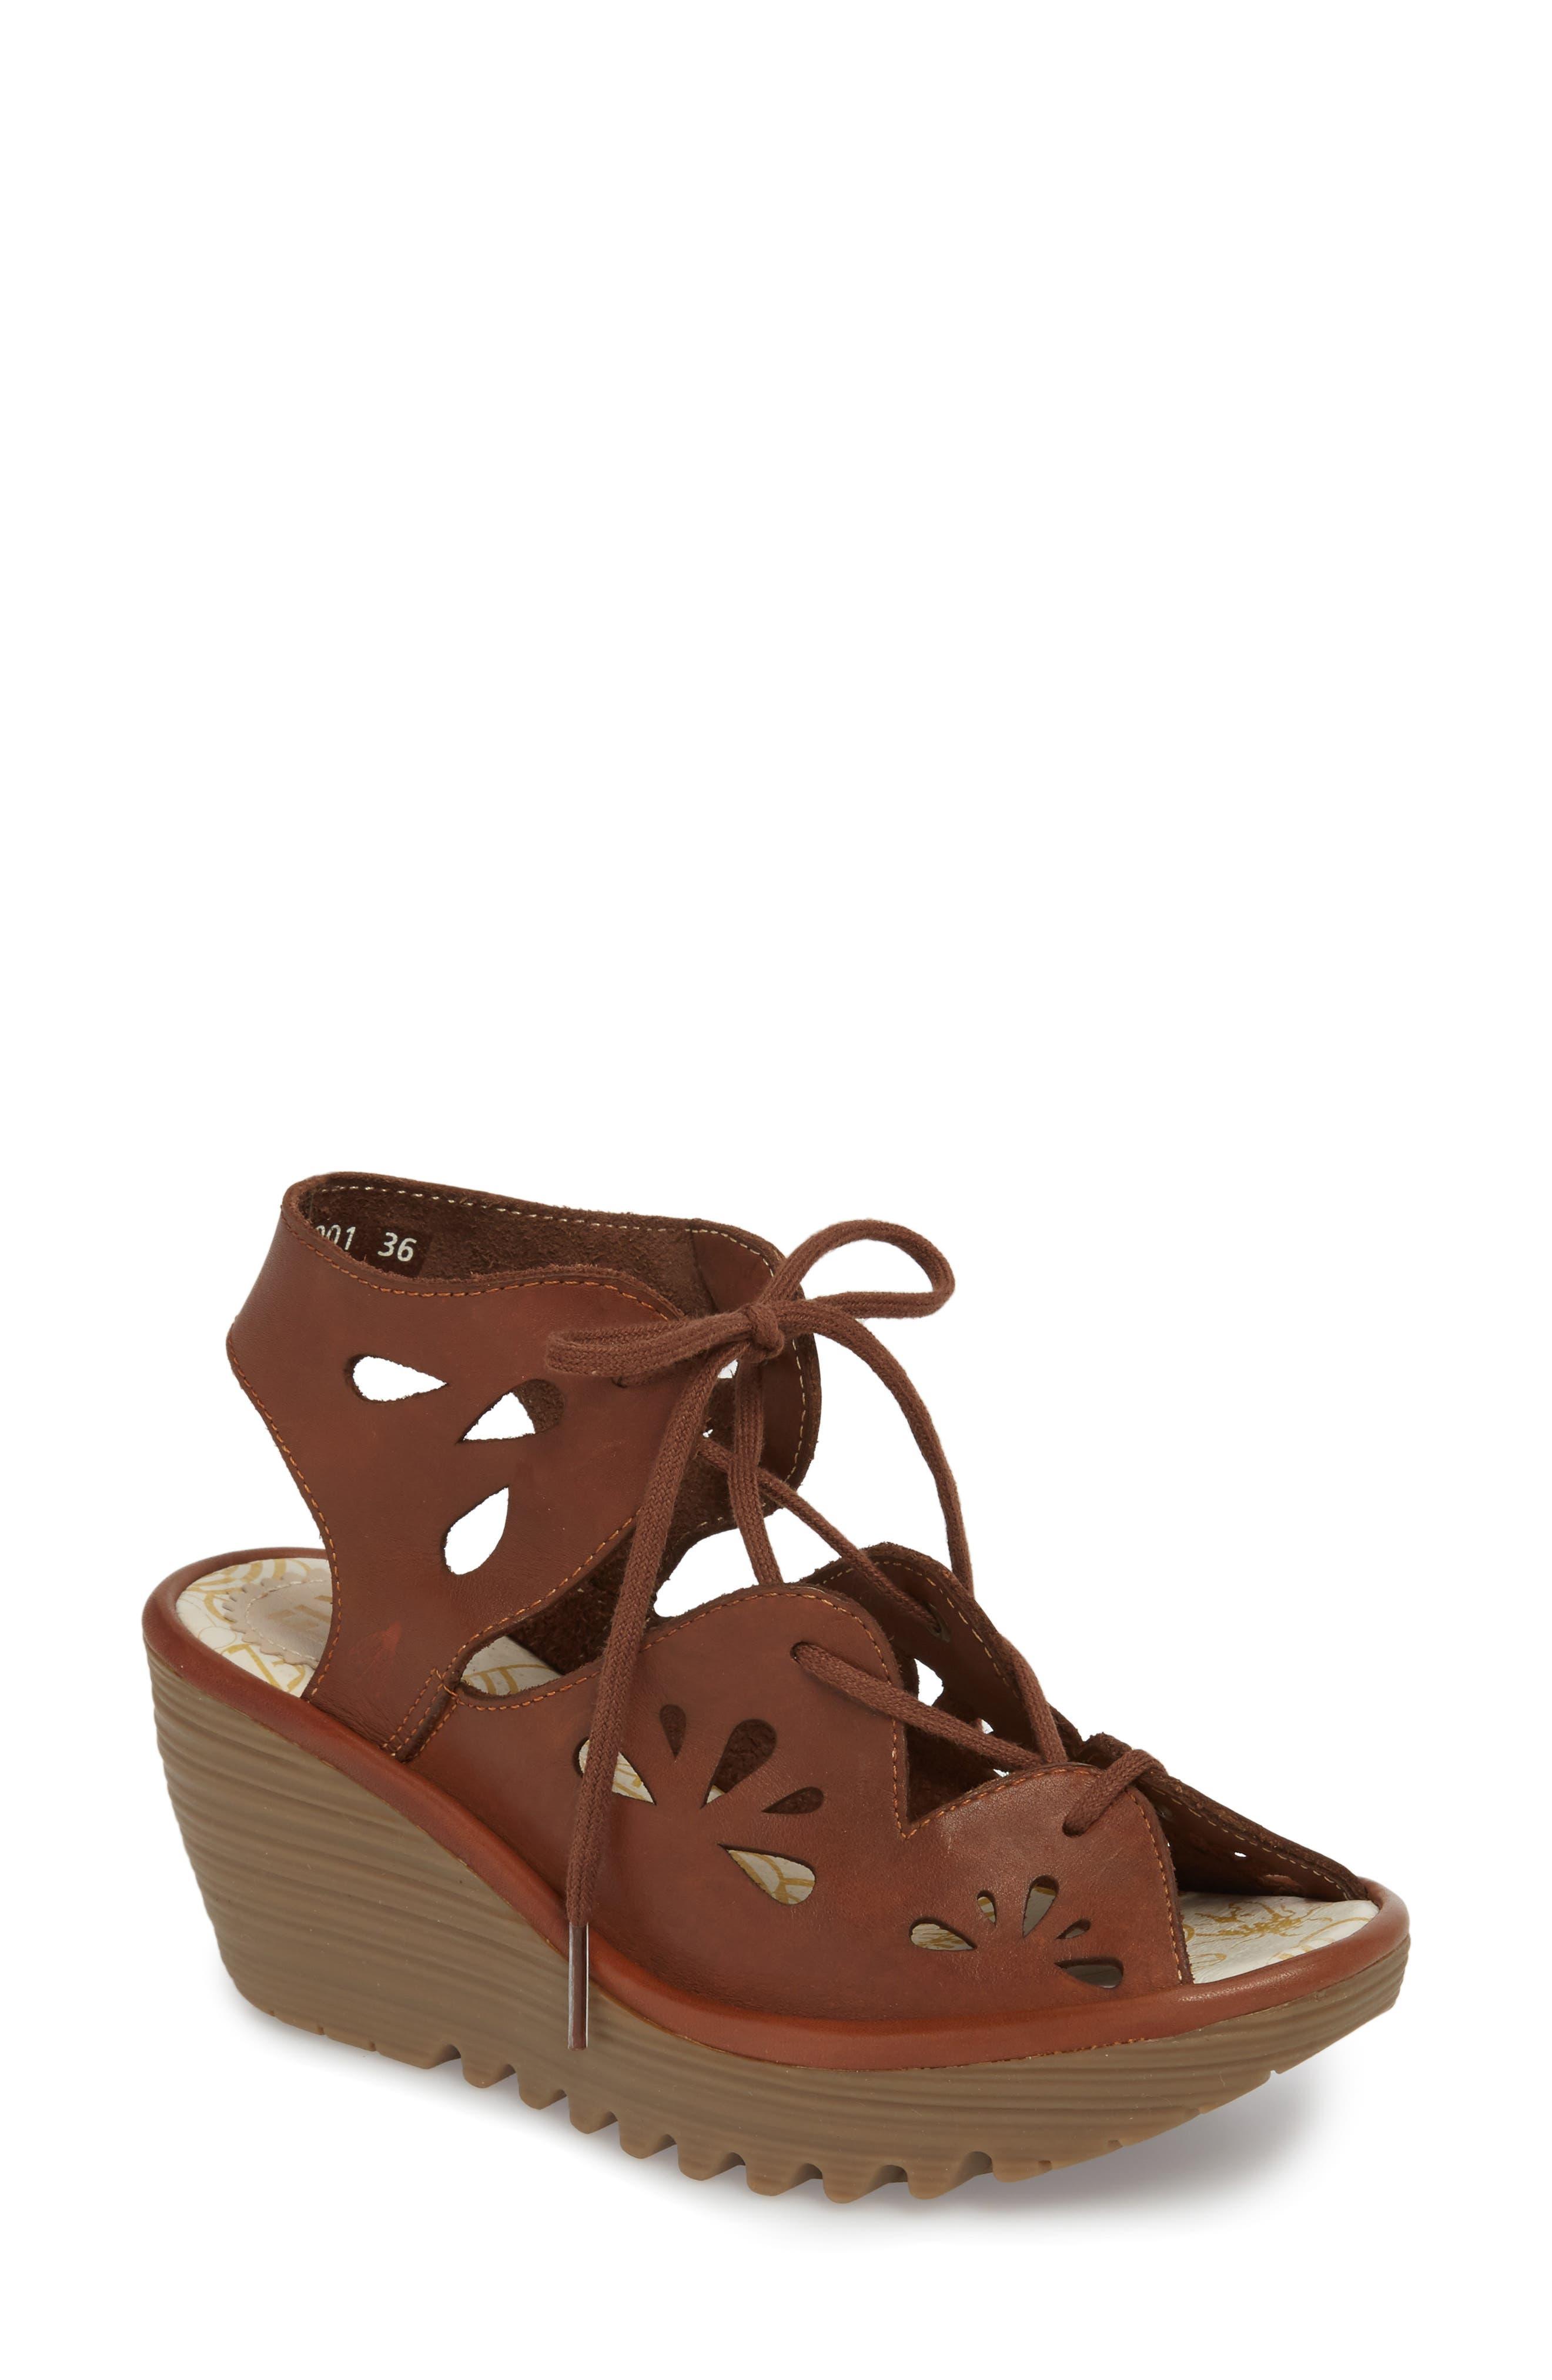 Yote Sandal,                             Main thumbnail 1, color,                             Brown Colmar Leather